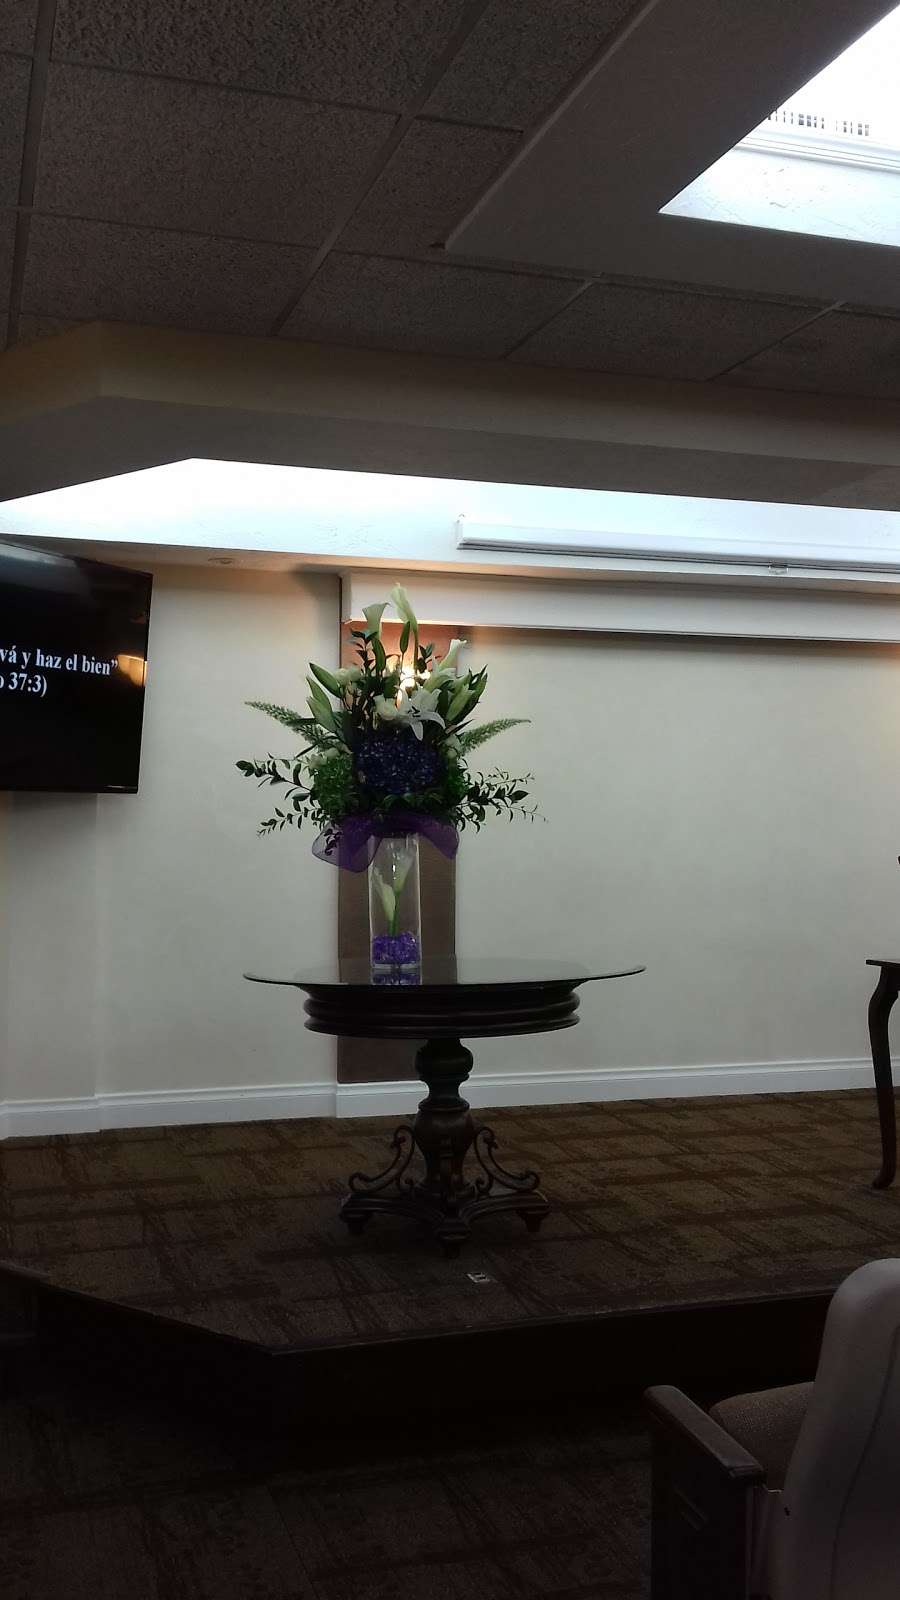 Kingdom Hall of Jehovah's Witnesses - church  | Photo 4 of 7 | Address: 5811 N Pine Island Rd, Tamarac, FL 33321, USA | Phone: (954) 726-2229